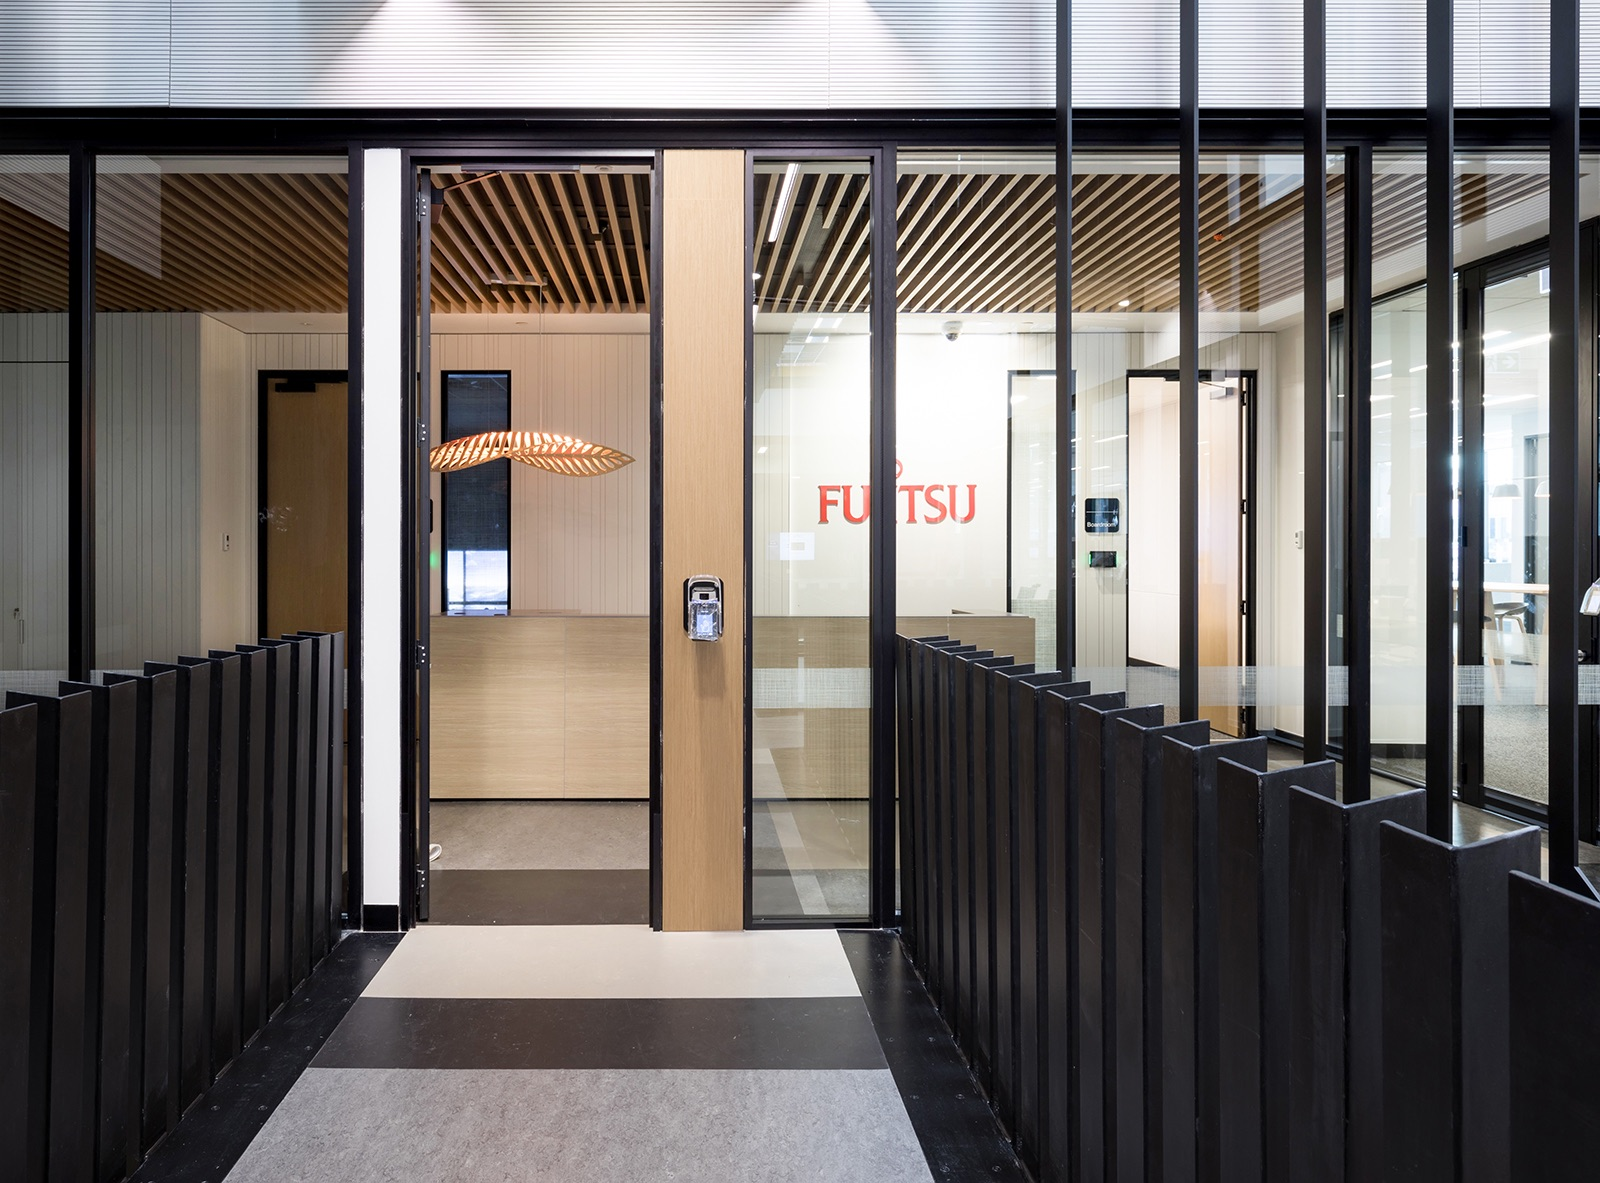 fujitsu-auckland-office-2